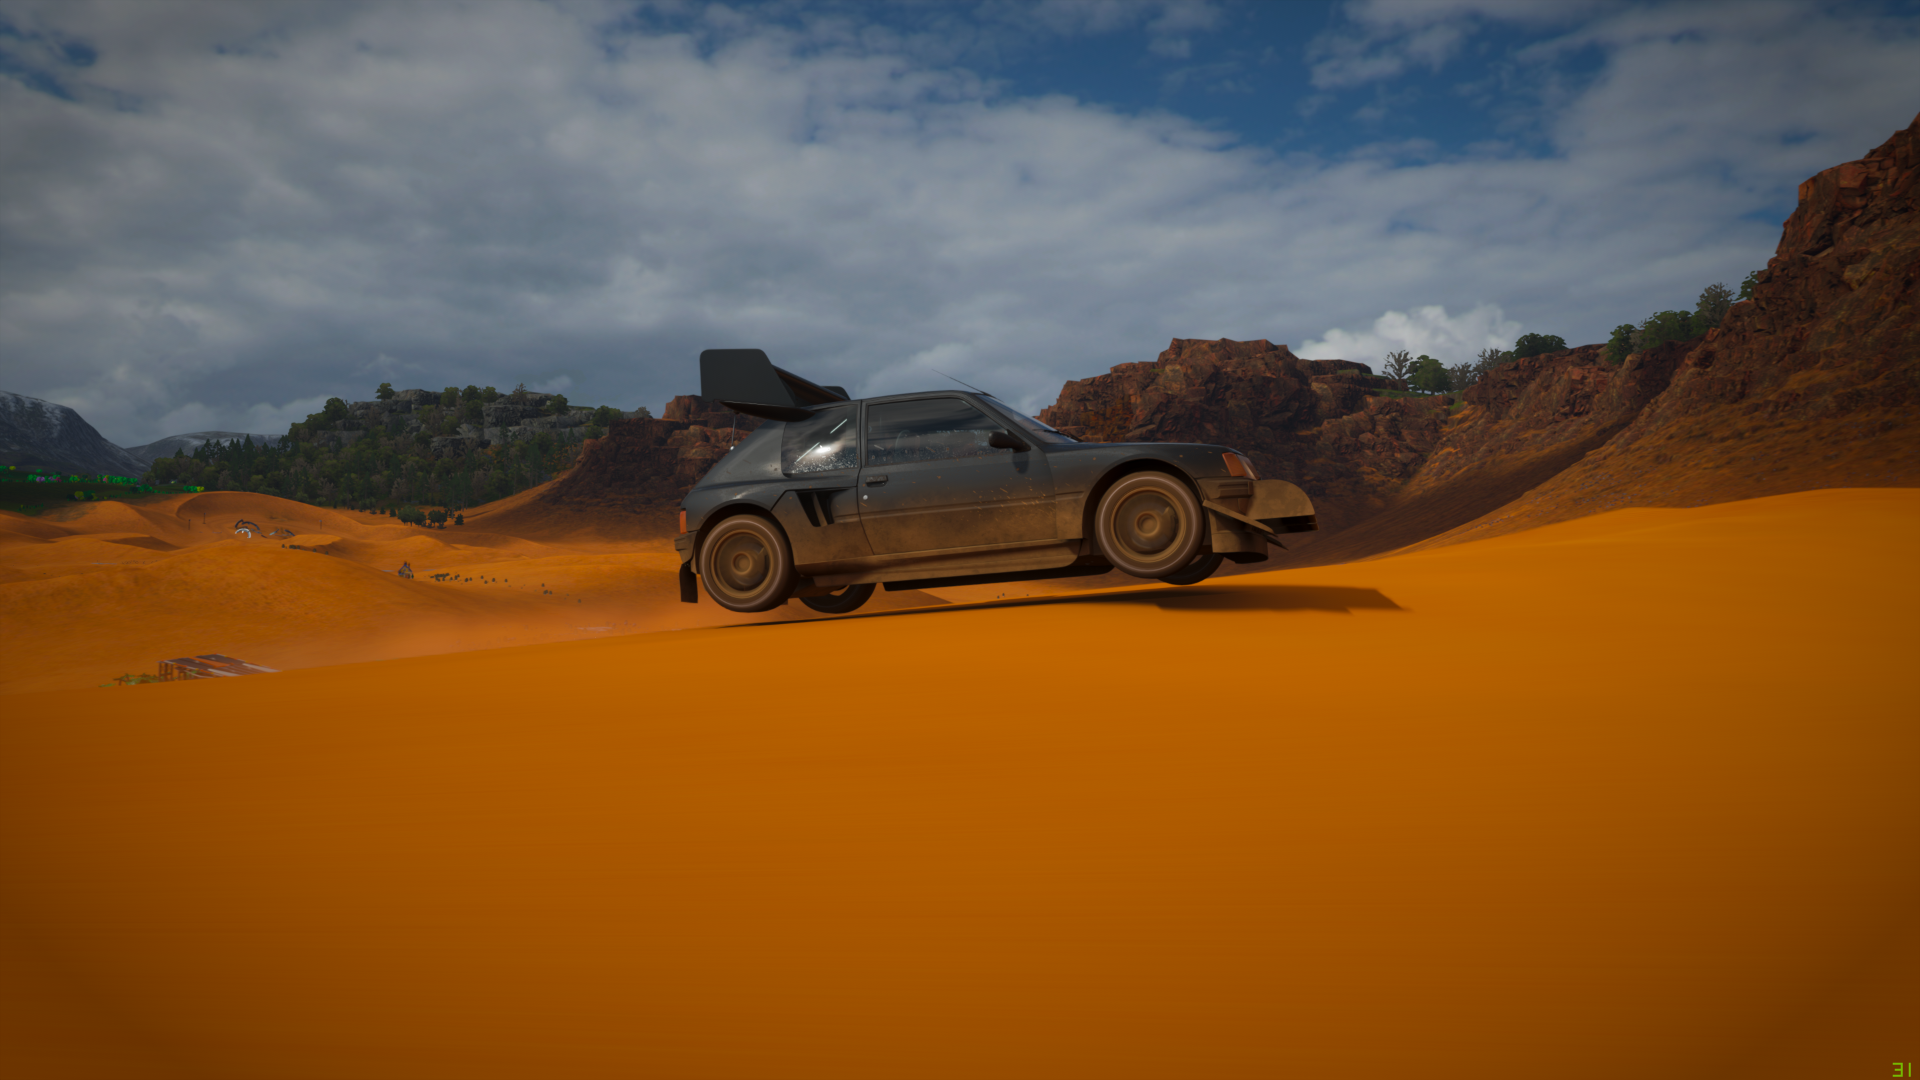 Forza Horizon 4 26.08.2019 22_33_29.png - Forza Horizon 4